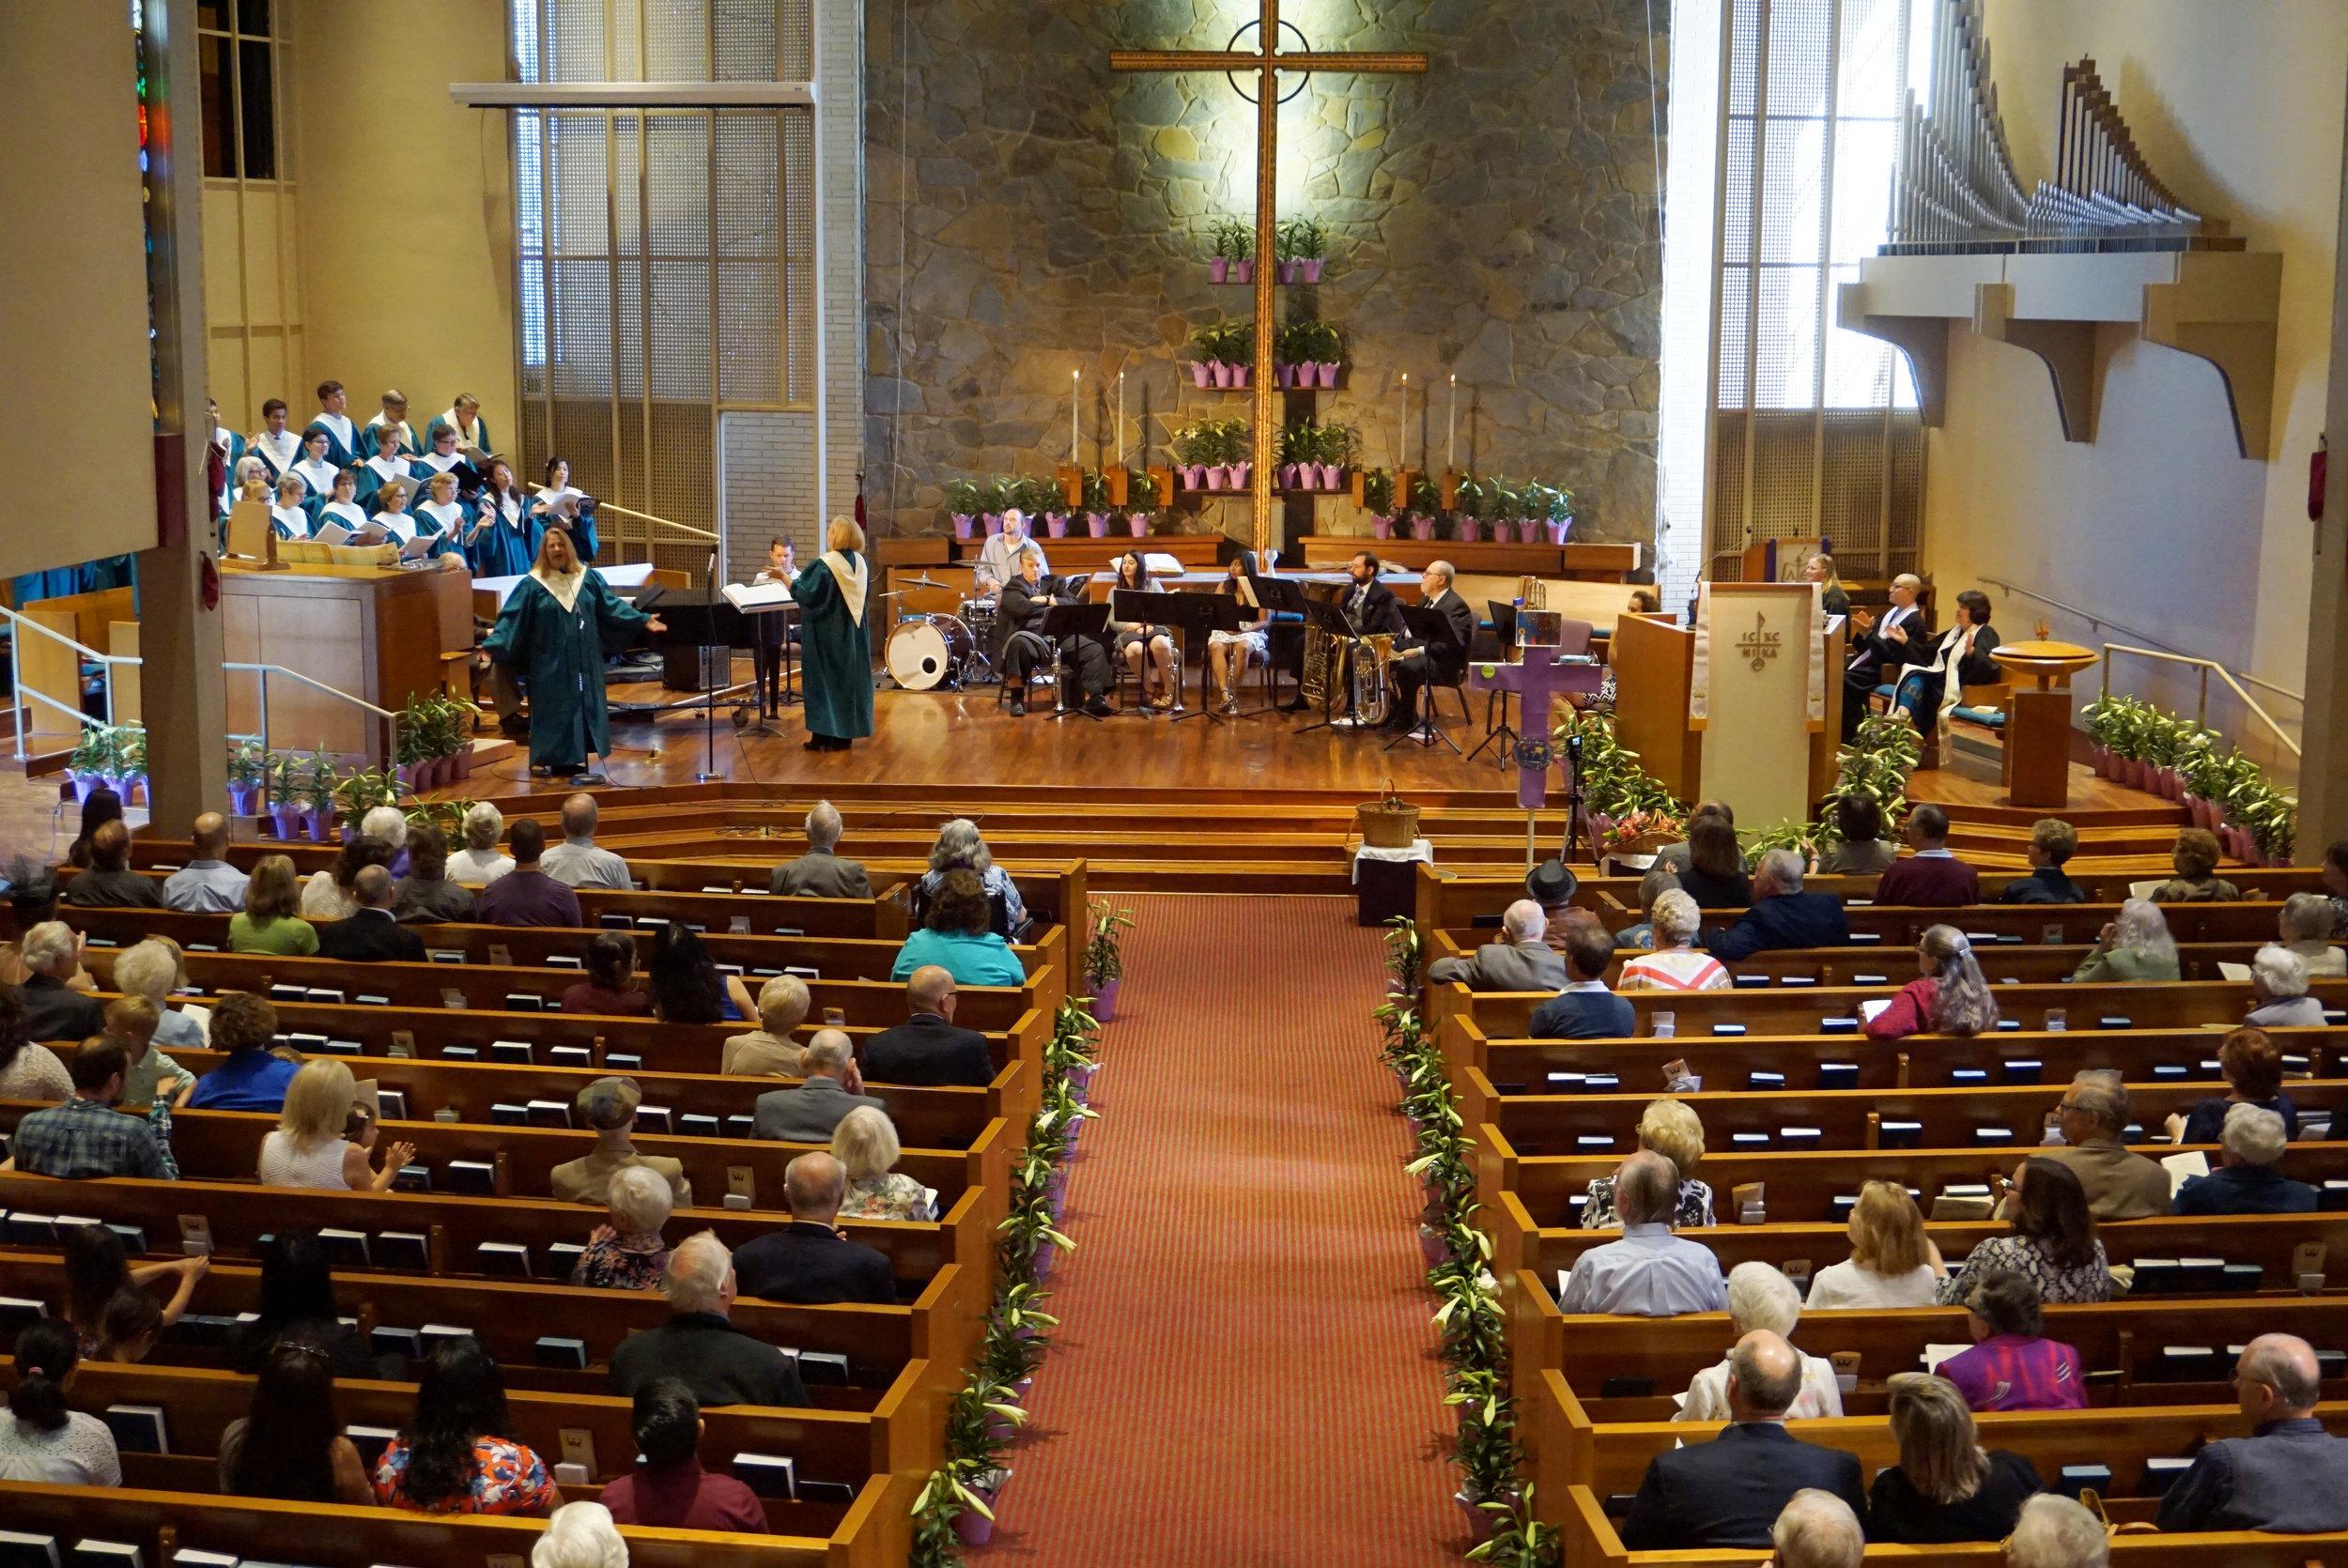 Claremont-Presbyterian-Church-Congregation-22.jpg